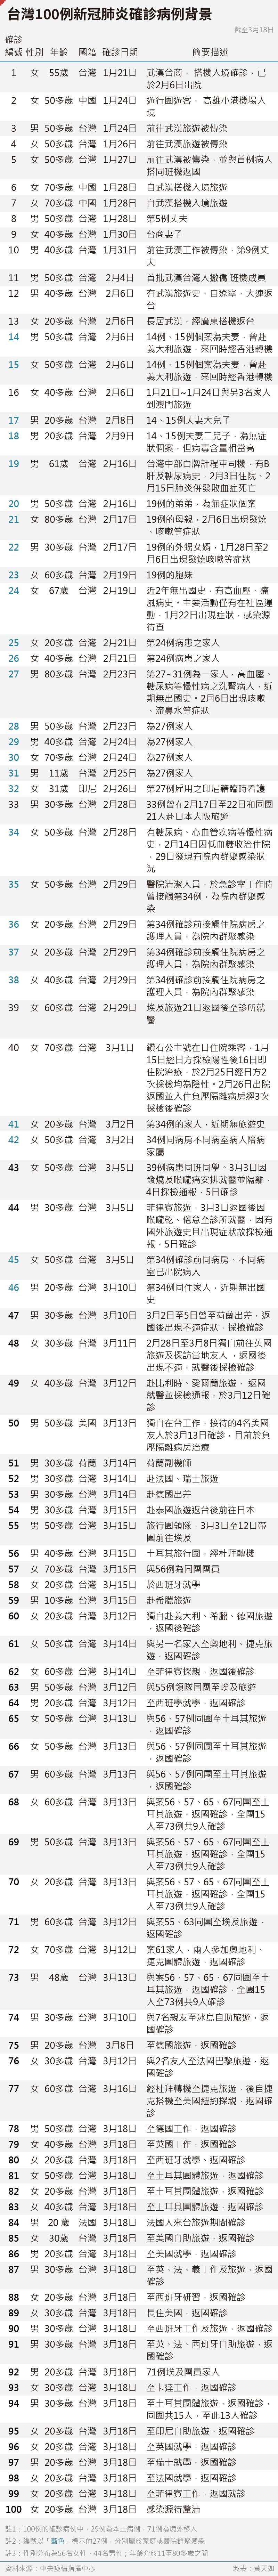 20200320-SMG0035-黃天如_A台灣100例新冠肺炎確診病例背景